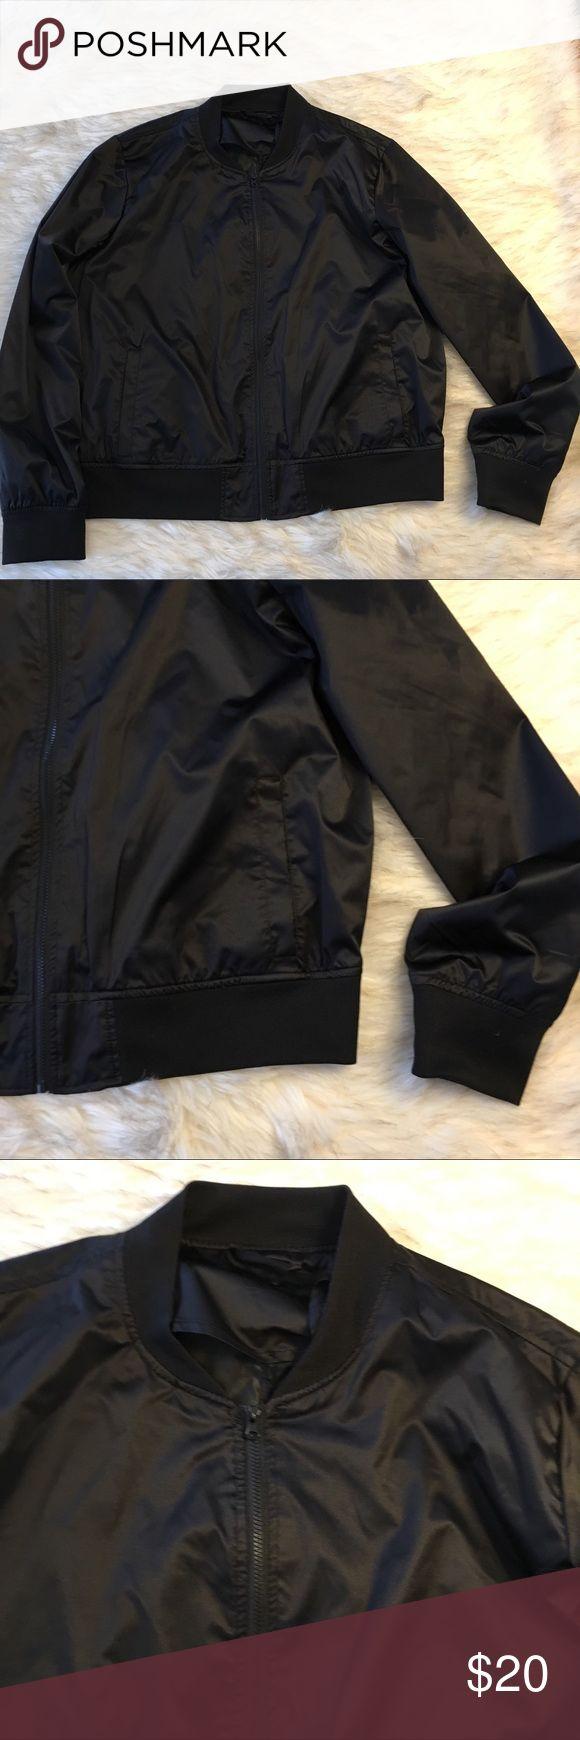 Lightweight Black Bomber Jacket NWOT Get the look! Great, lightweight Bomber Jacket new without tags- never worn. Jackets & Coats Utility Jackets